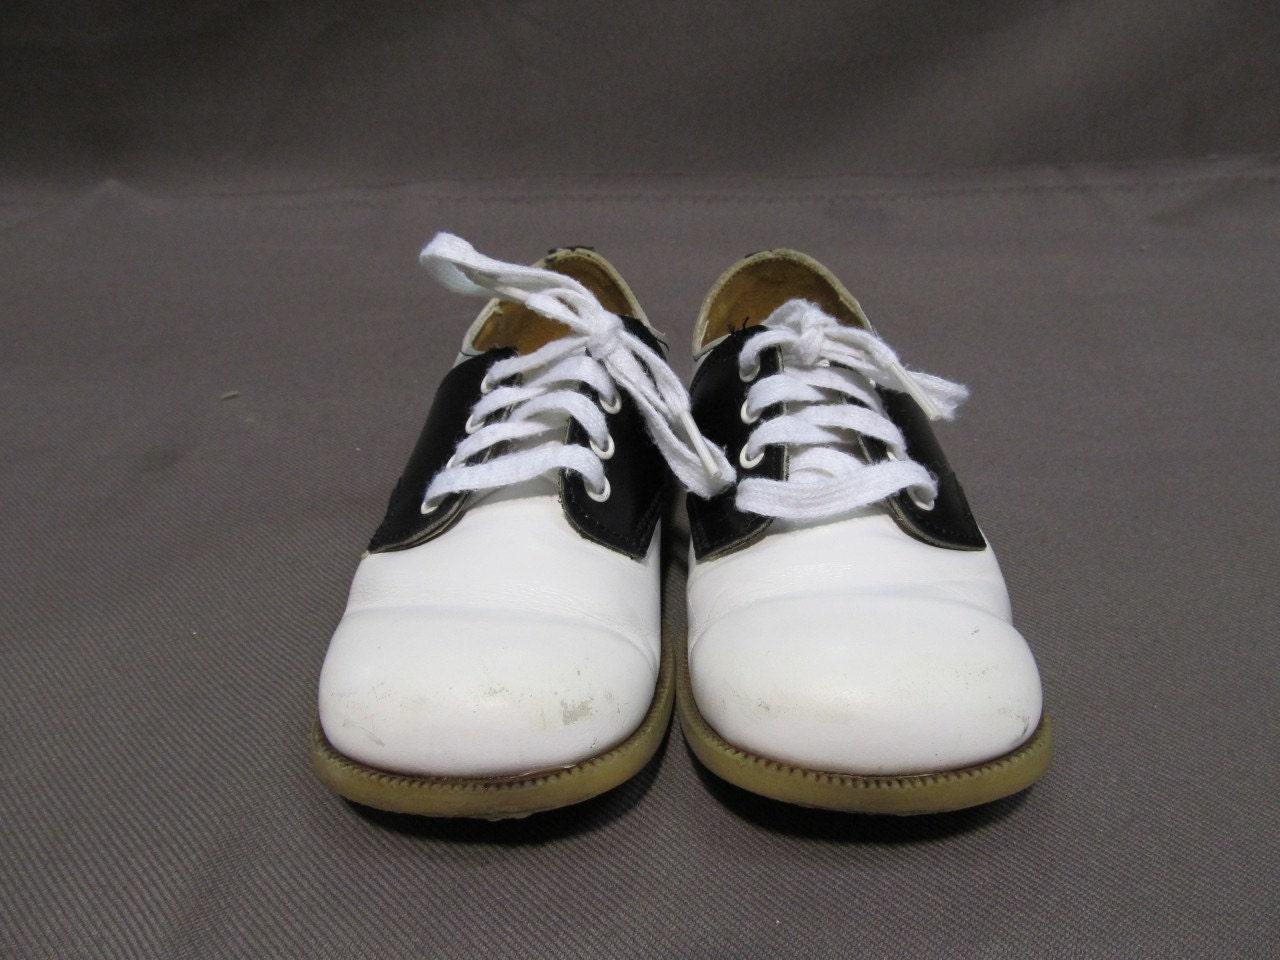 Vintage 1950s White Black Buster Brown Minnow SADDLE SHOES Original Box - FatherJoesVillages